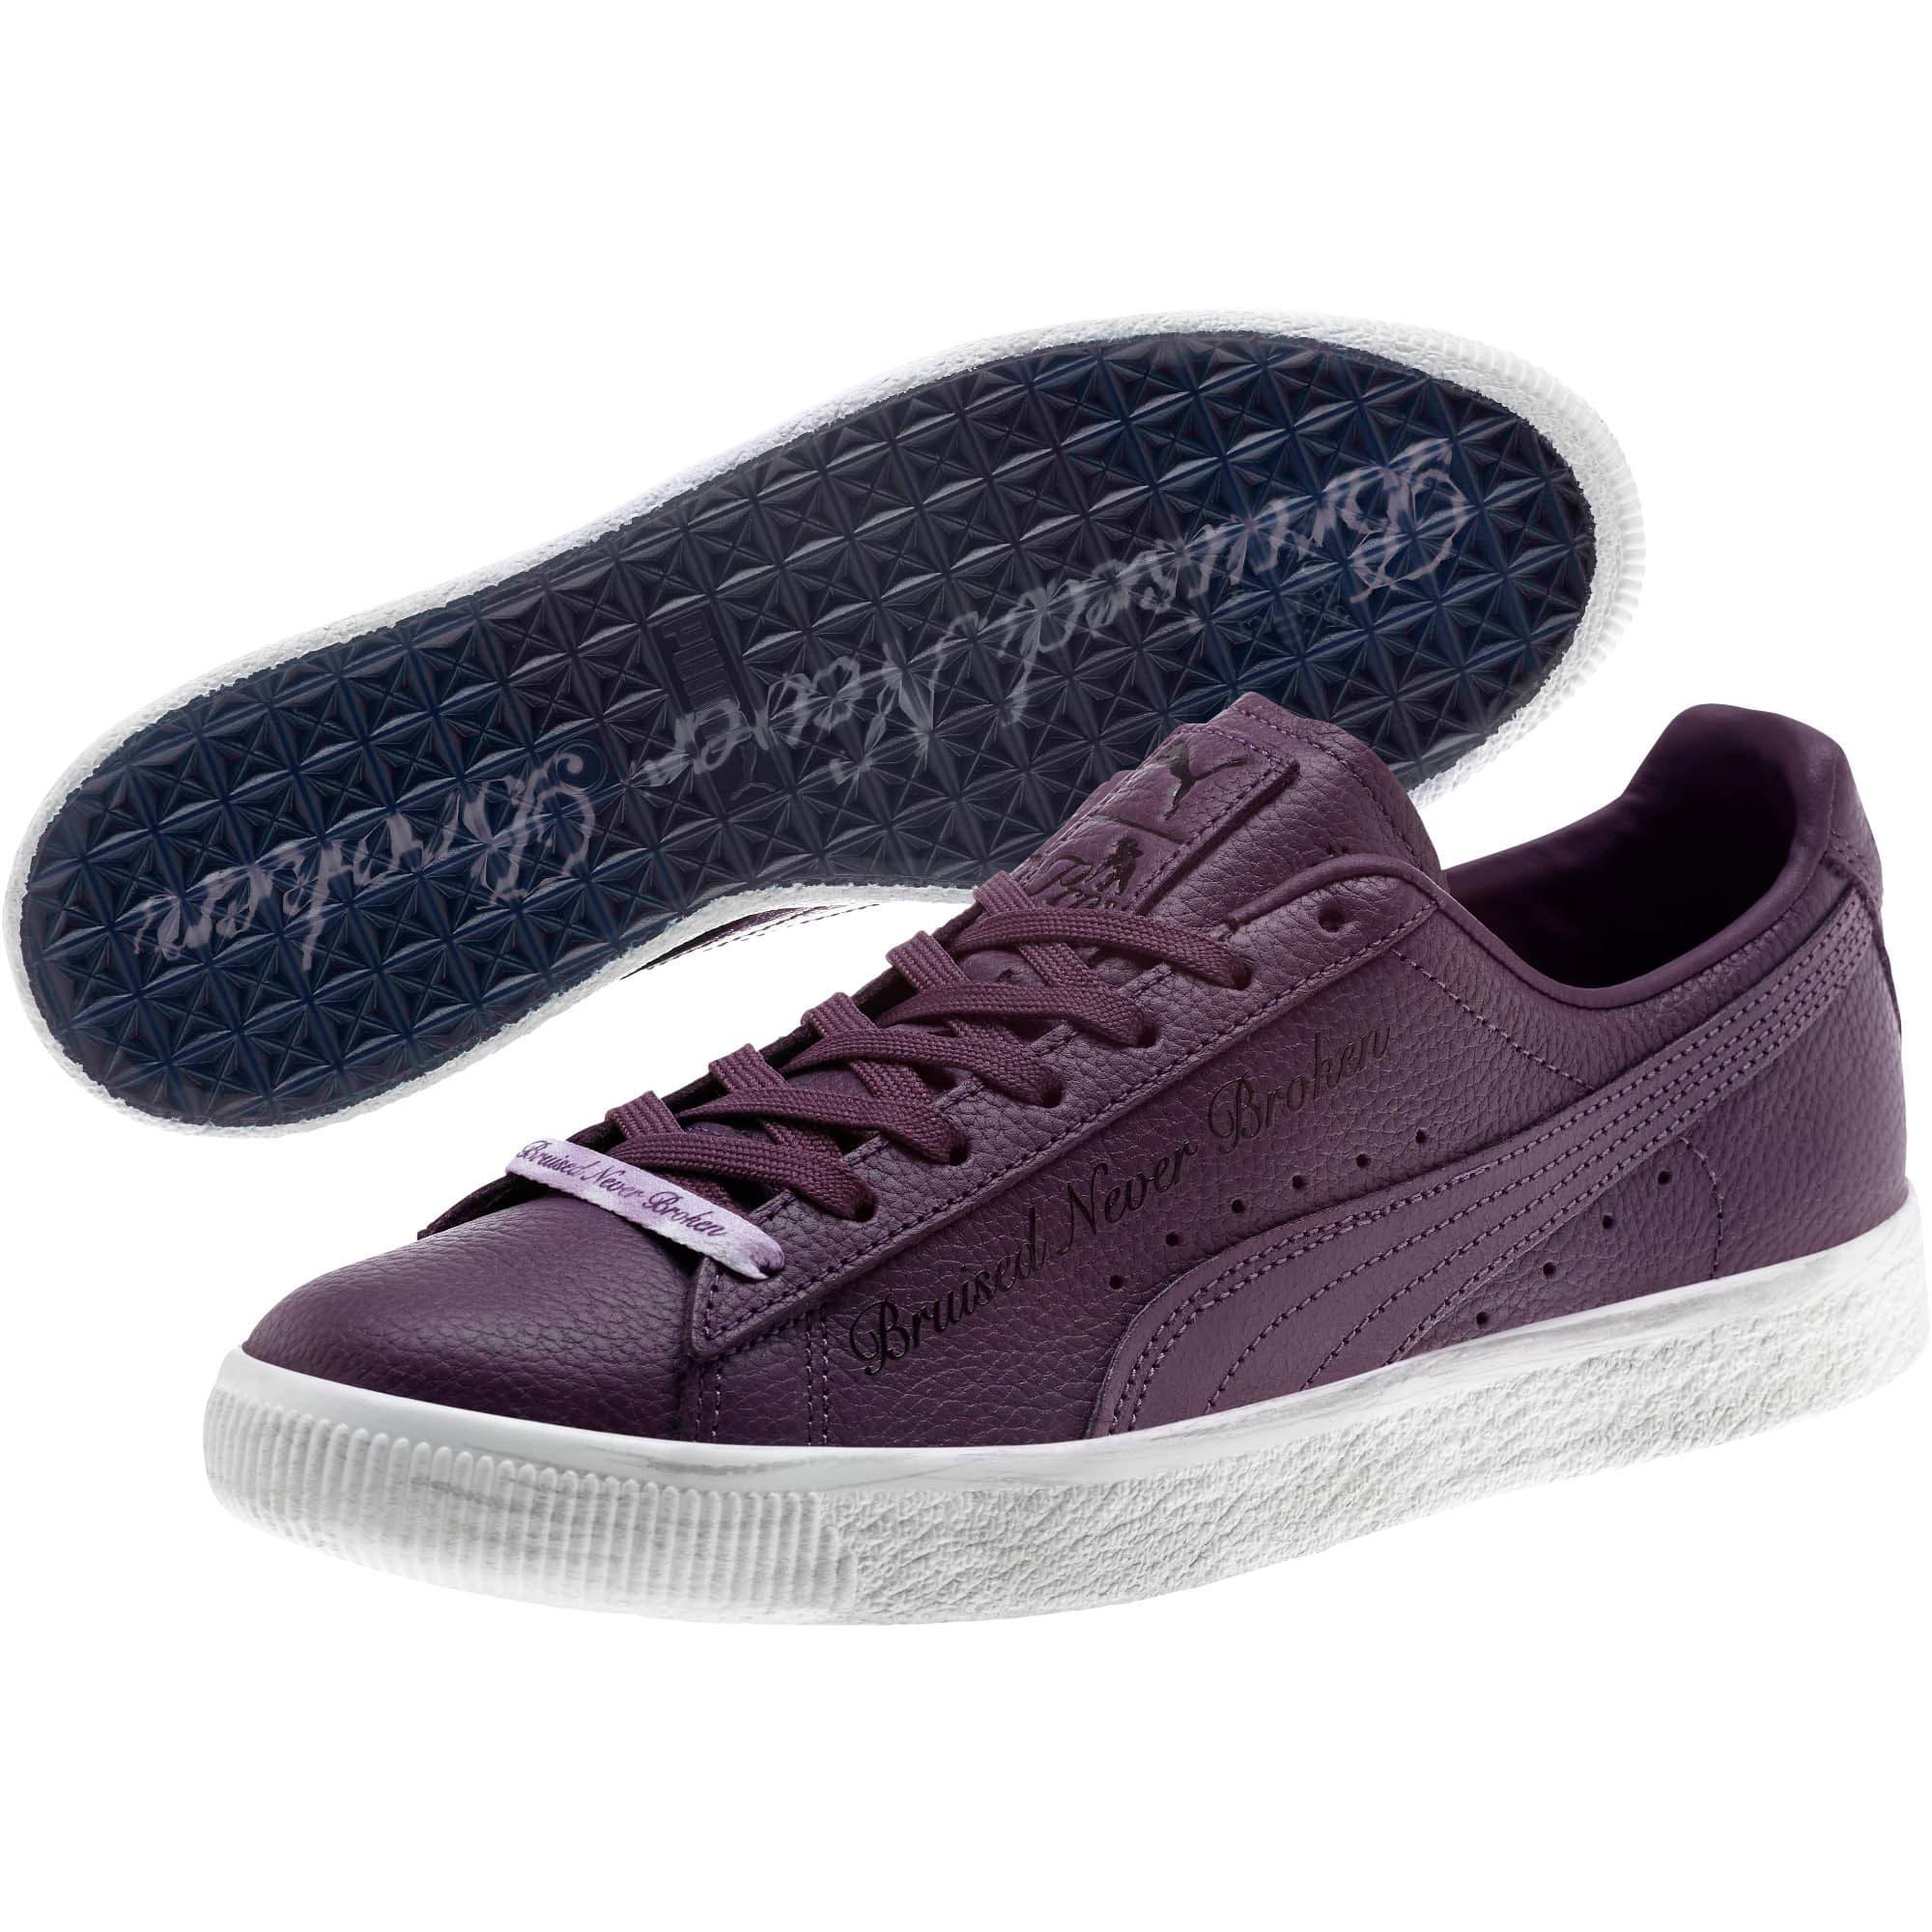 Thumbnail 2 of Clyde x PRPS Sneakers, Indigo-Puma Black, medium